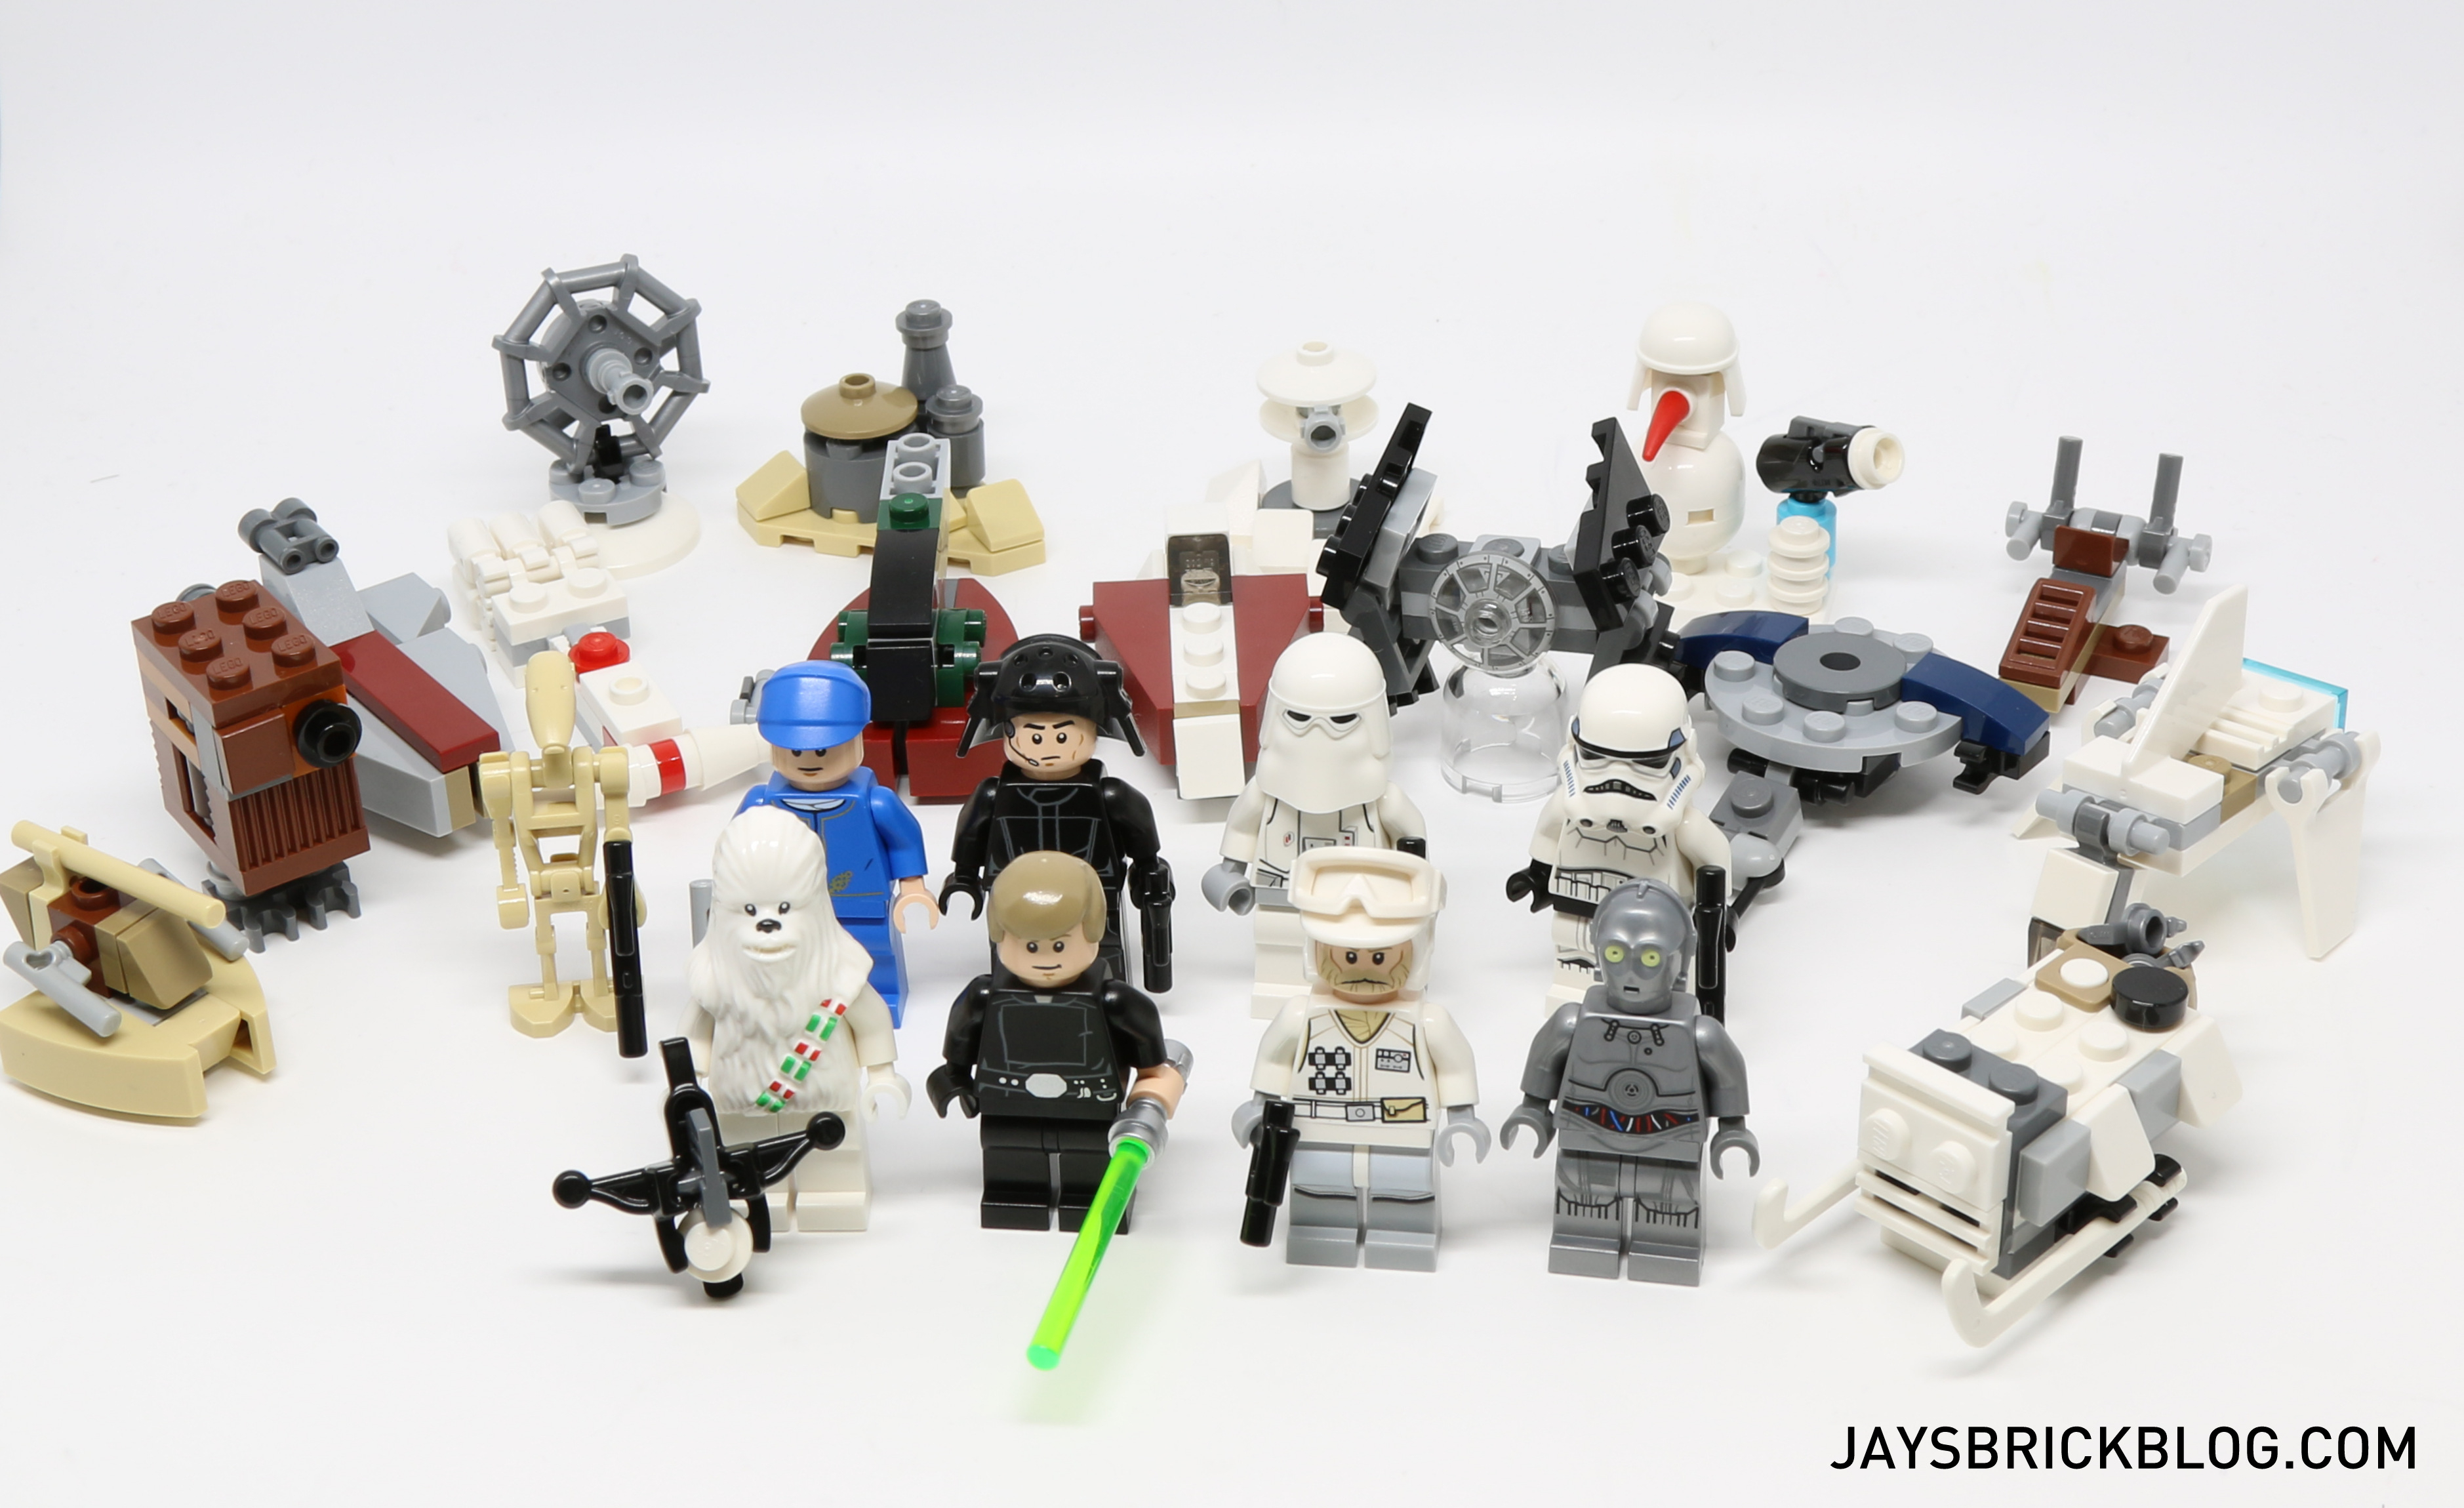 Lego Star Wars Advent Calendar 2016 – Jay's Brick Blog for Lego Star Wars Advent Calendar 2011 Instructions